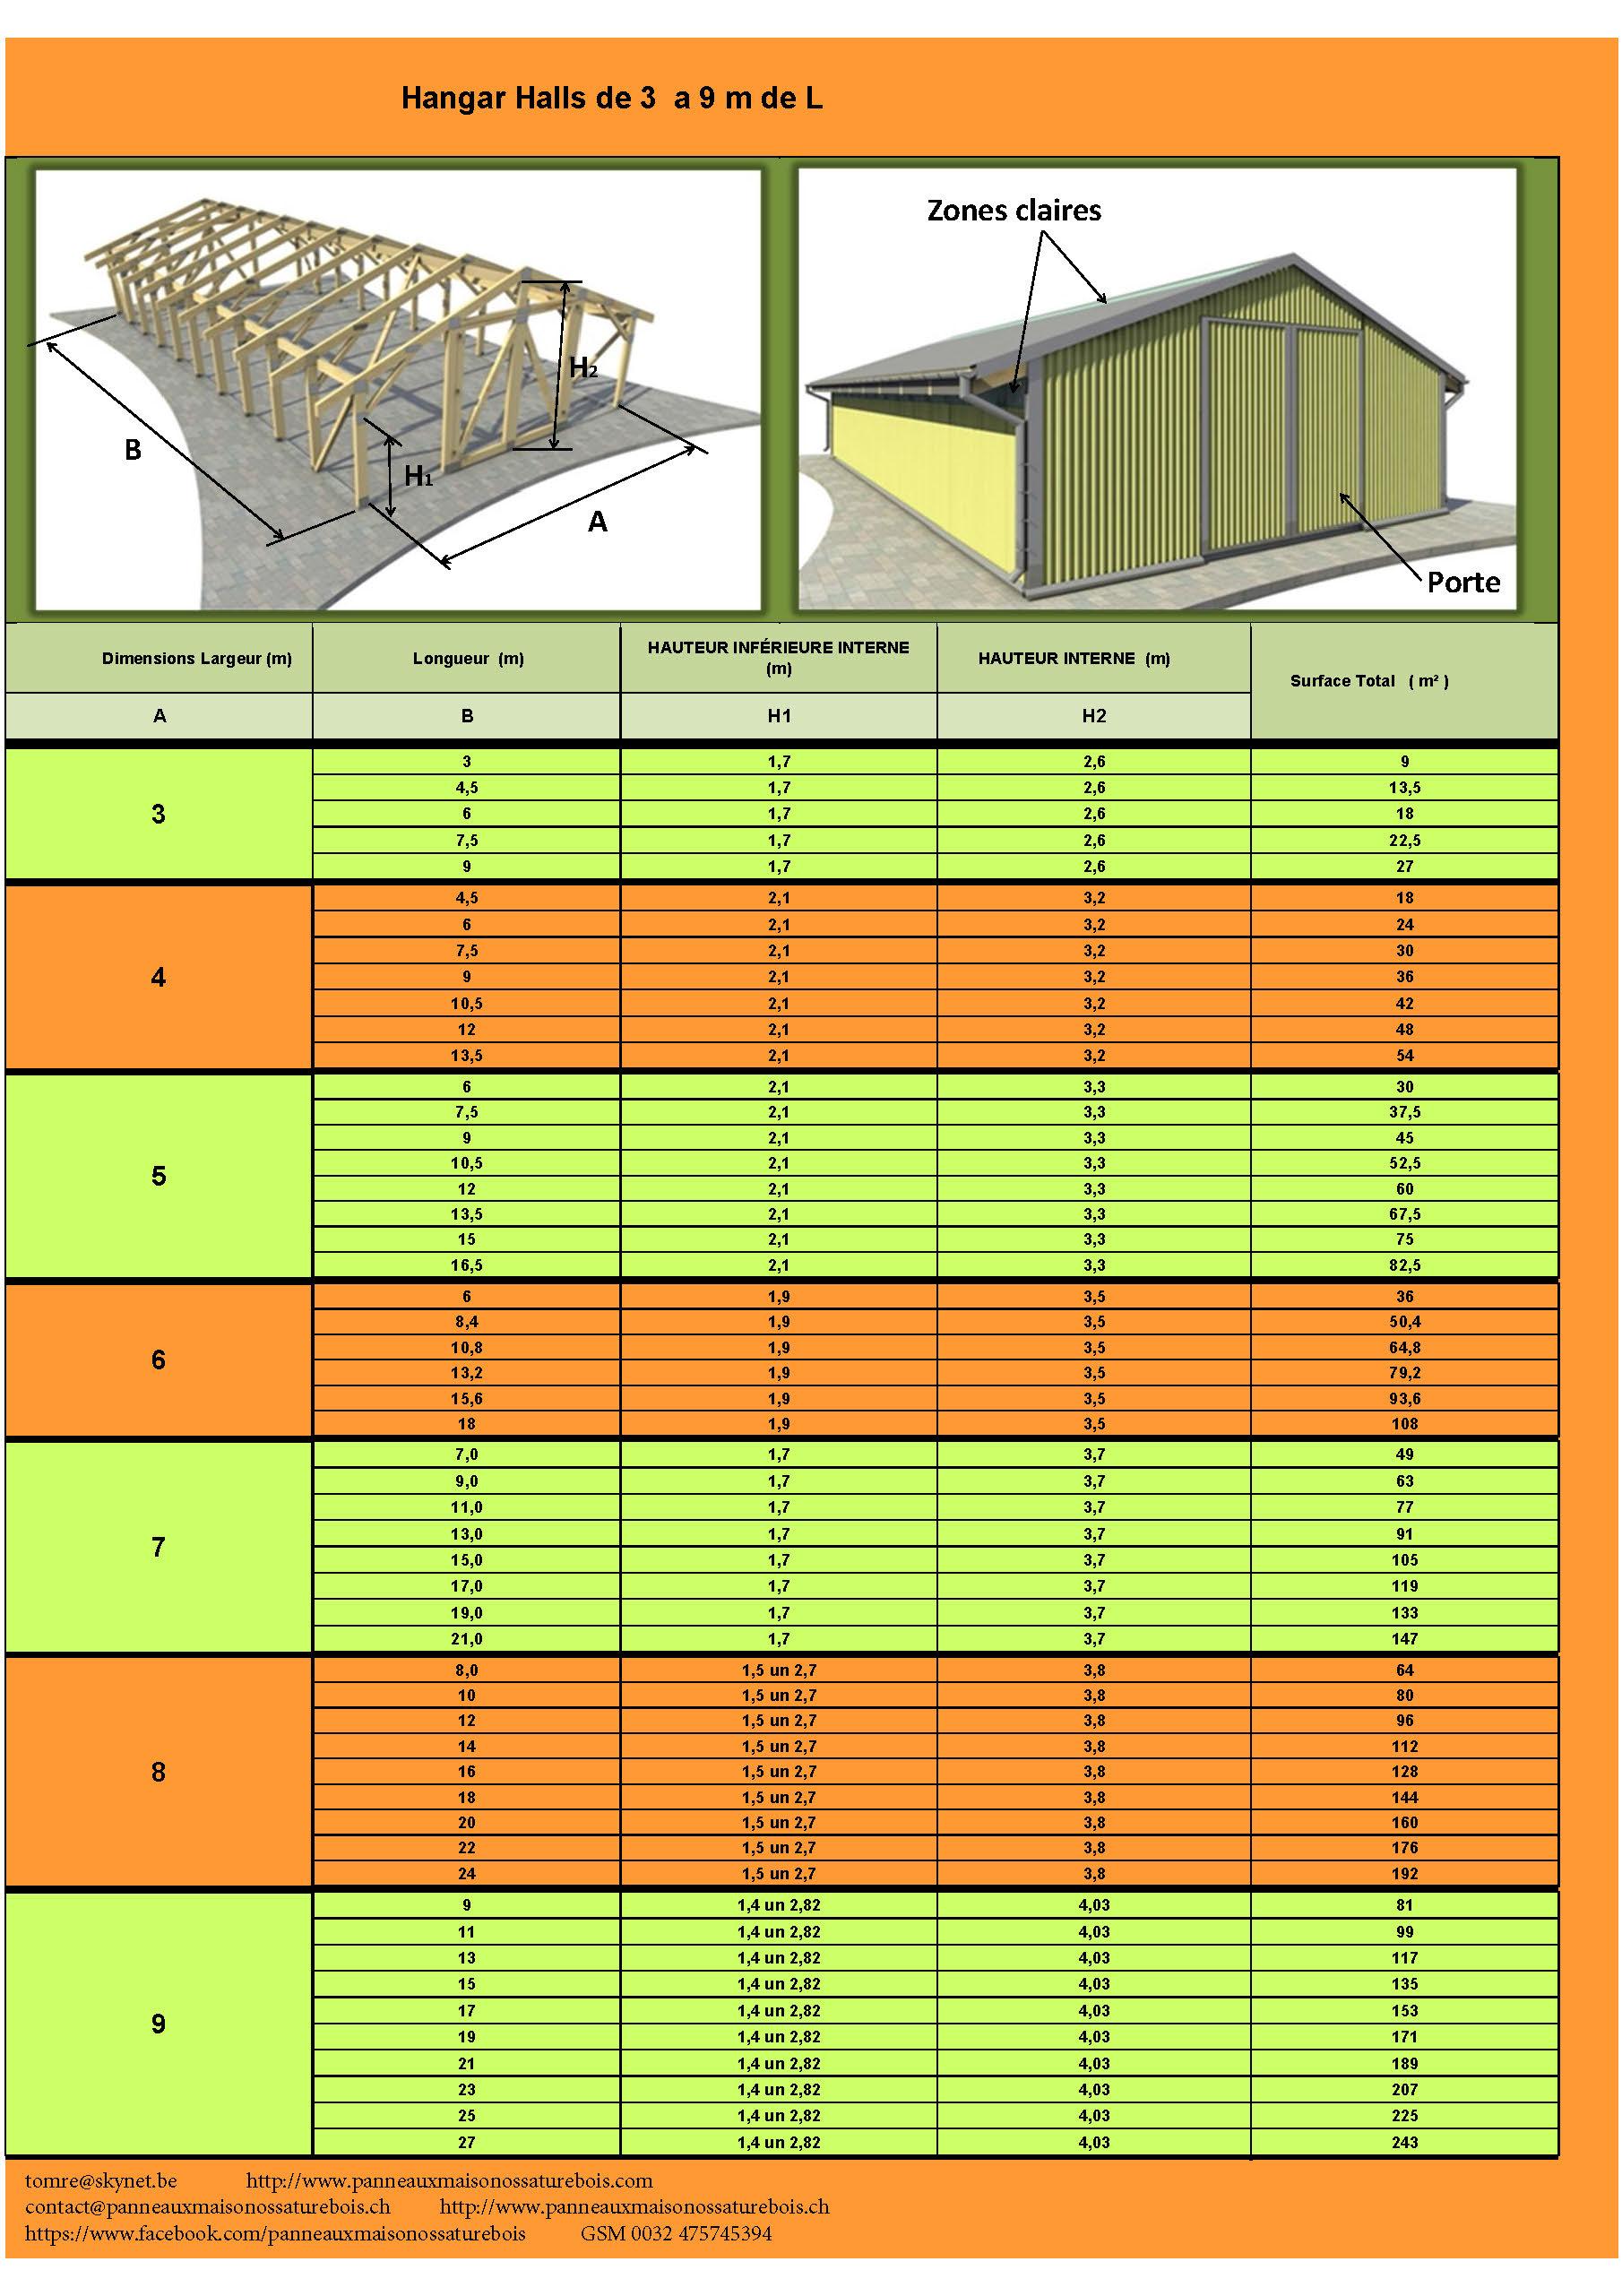 LV Hangar entrepots 3-9m